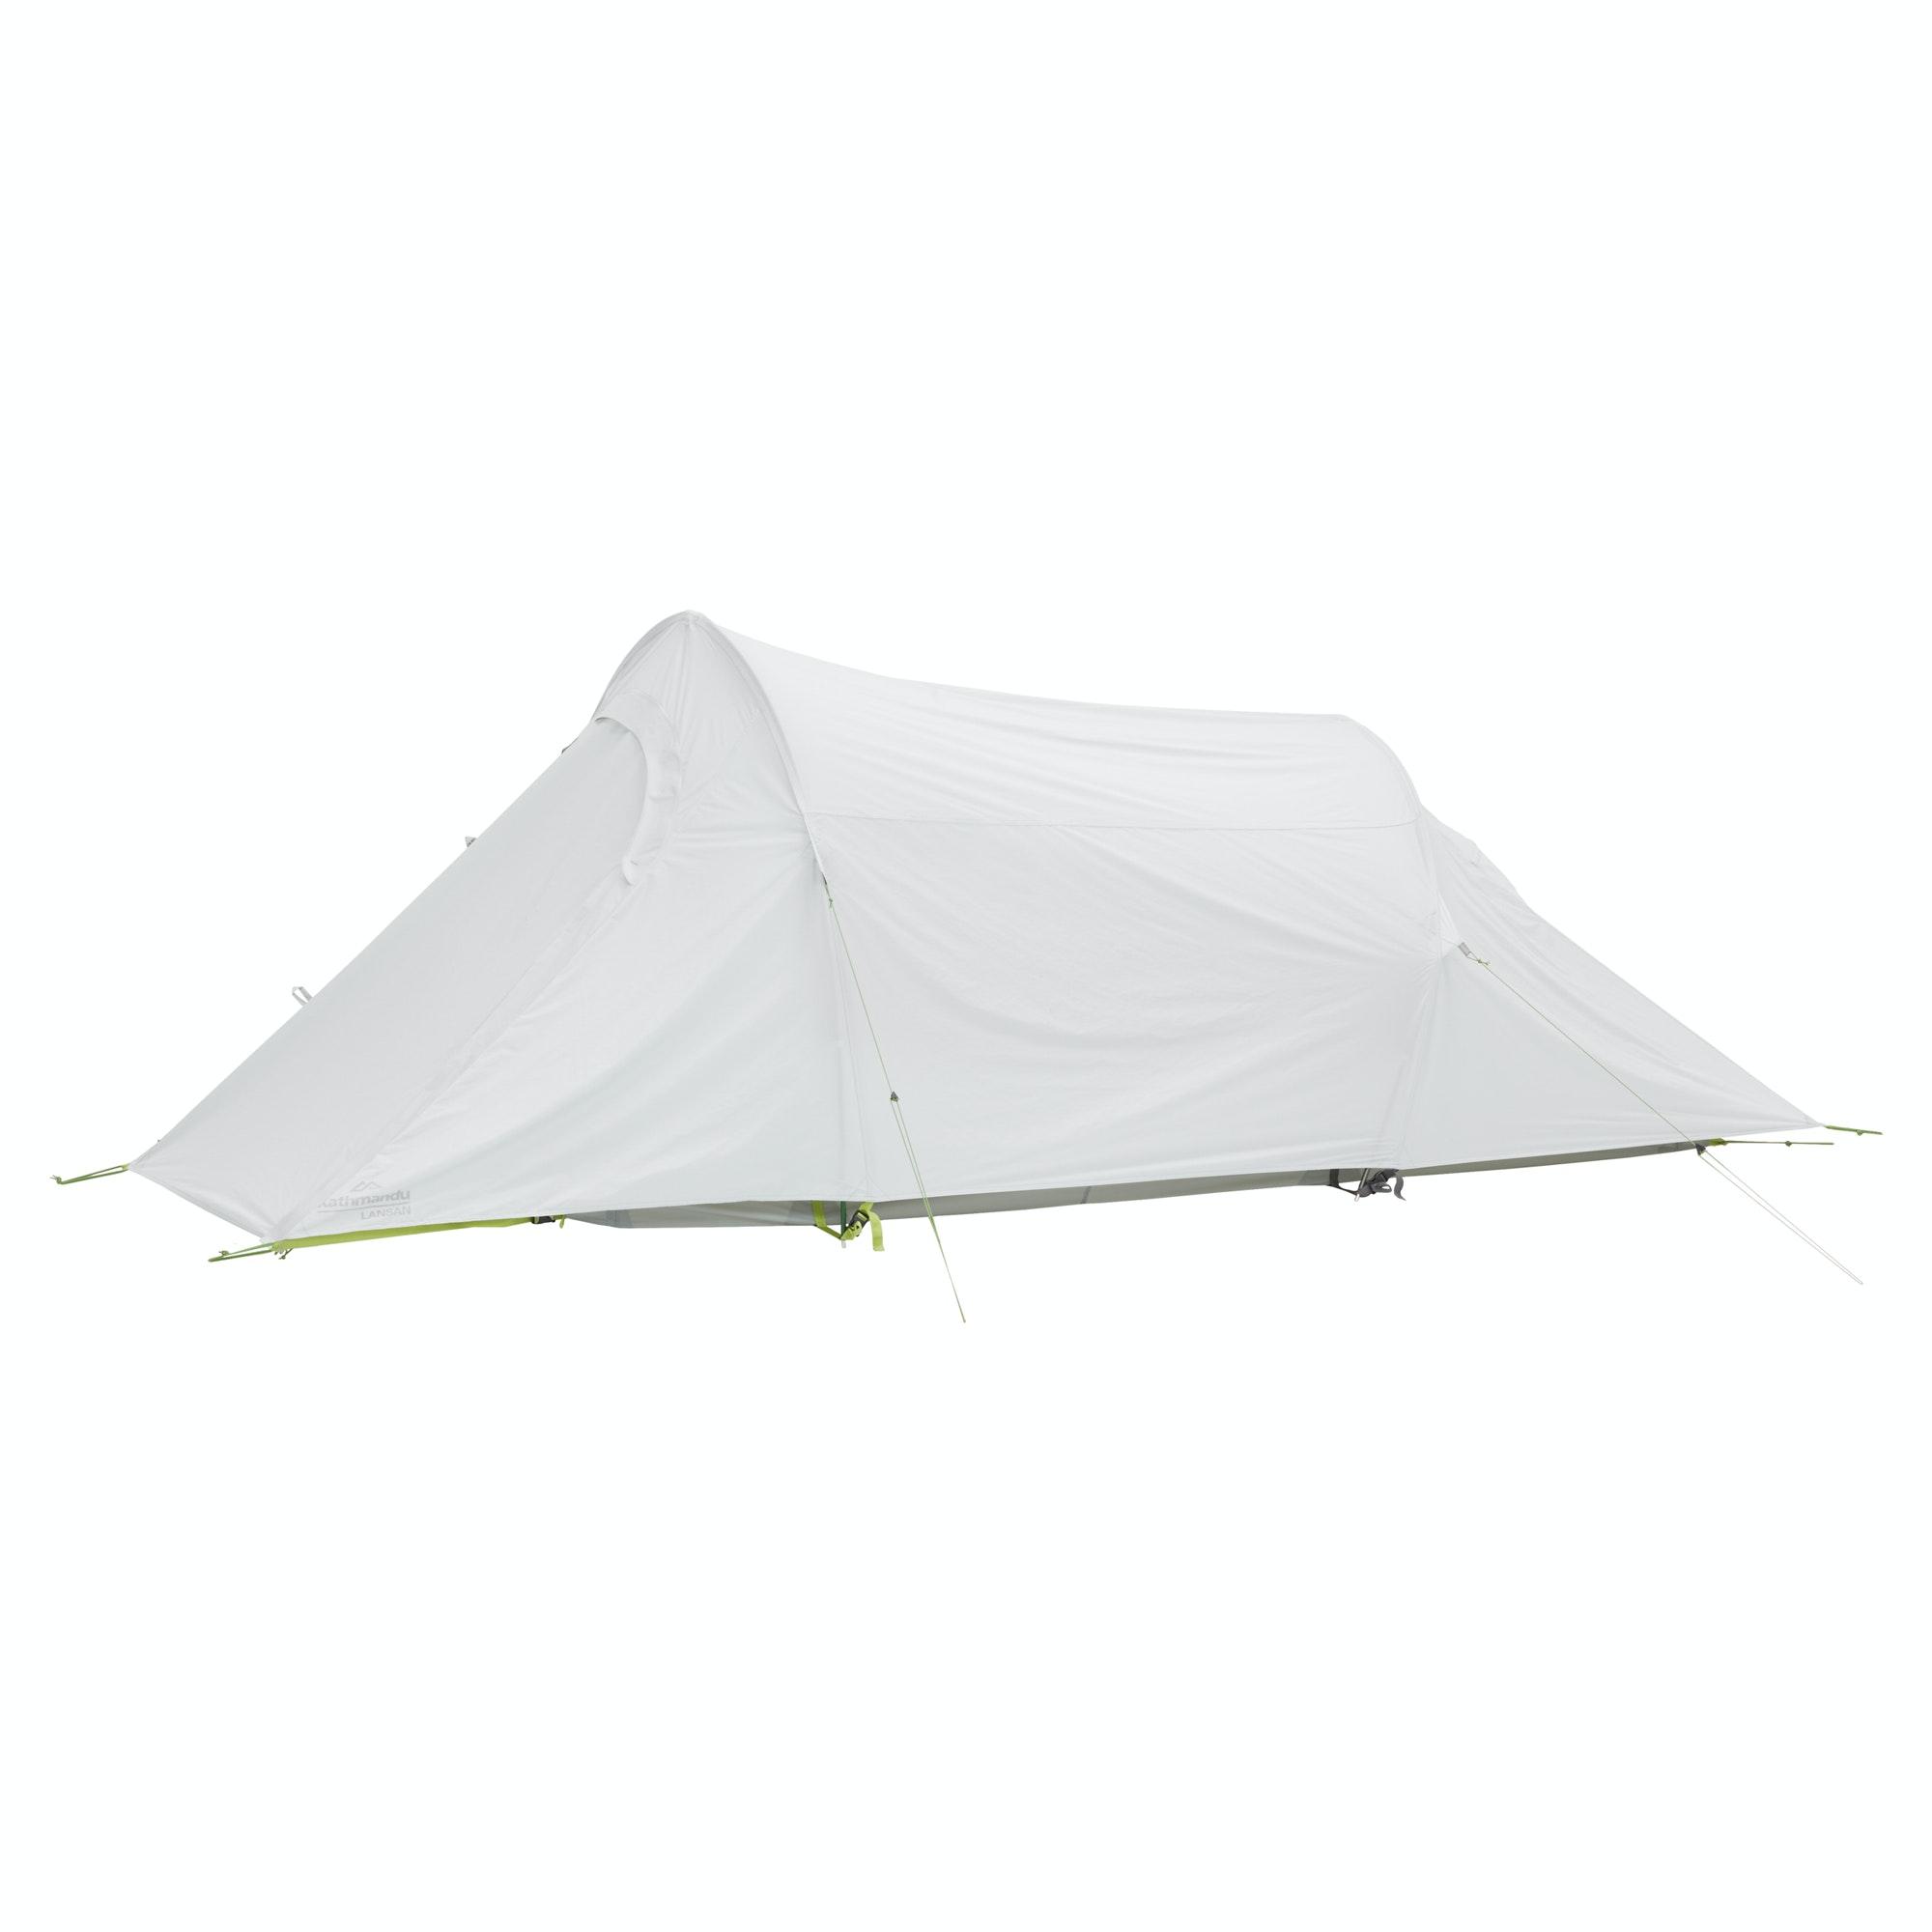 Lansan Ultralight Tent  sc 1 st  Kathmandu & Tents for Sale | 23456 u0026 7 Person Tent | Kathmandu Australia